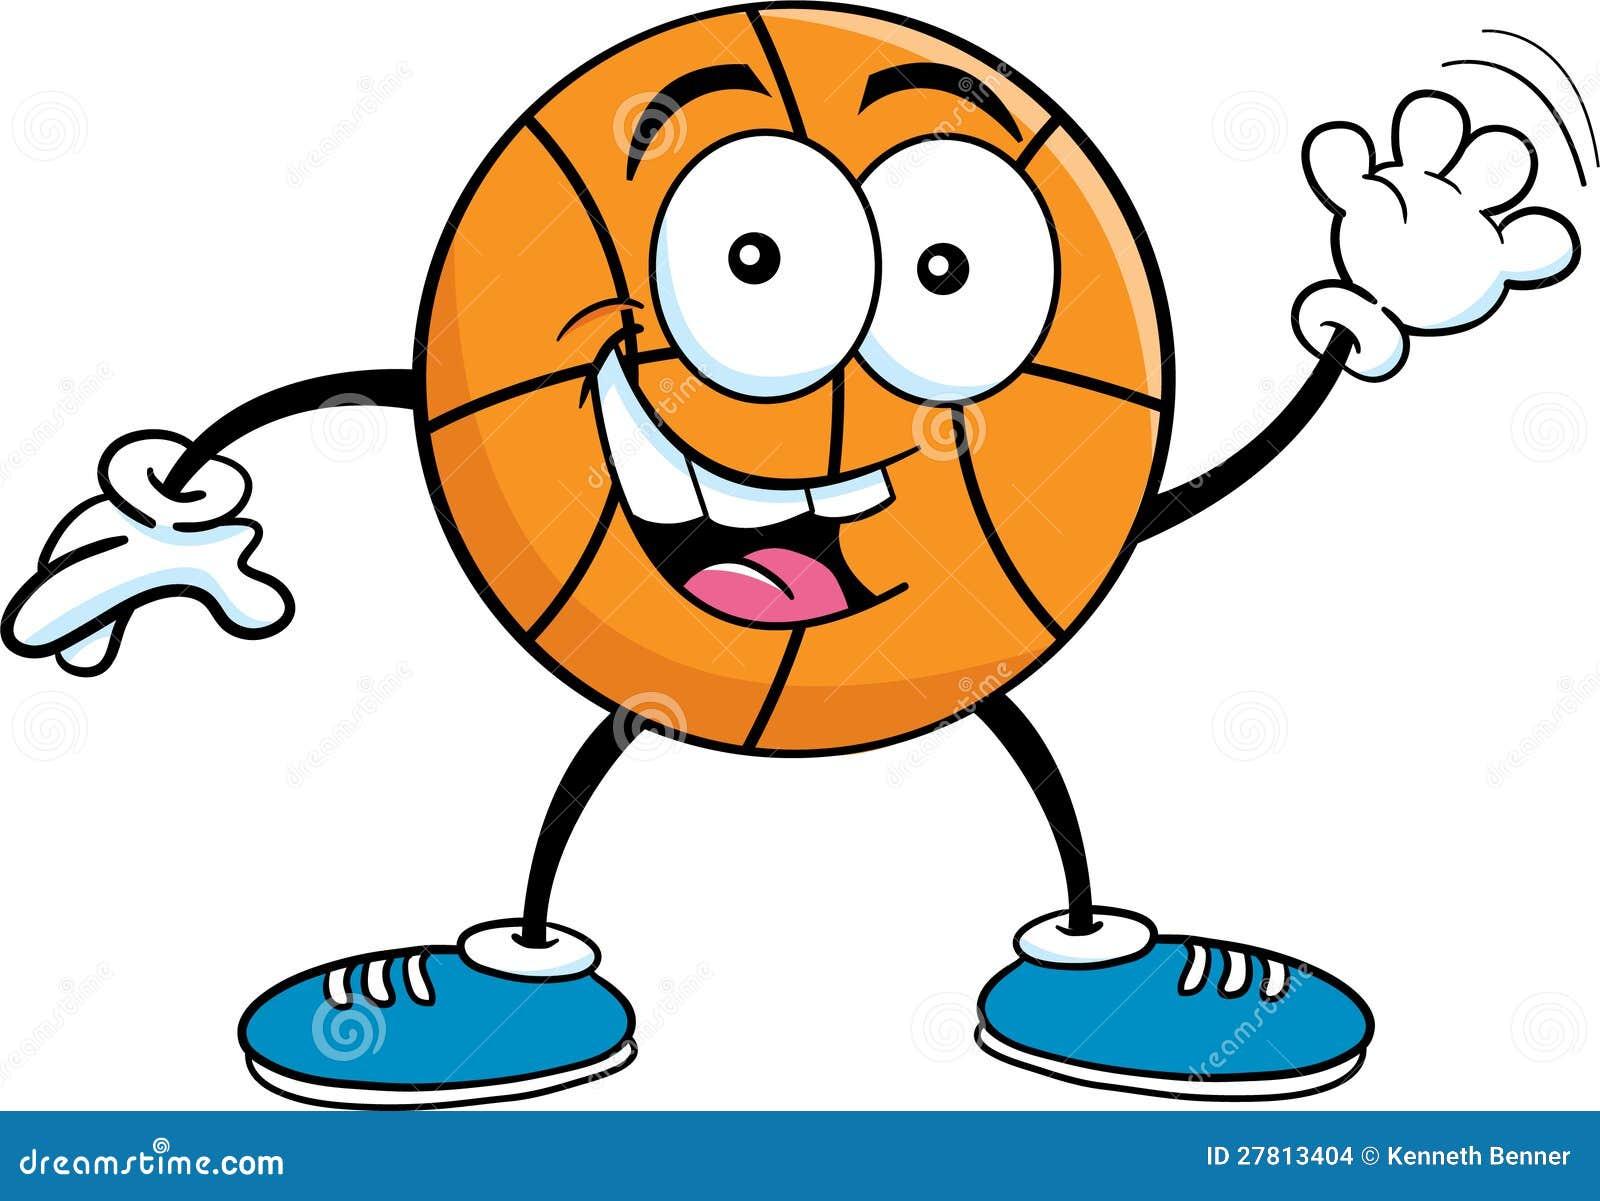 Cartoon Basketball Waving Stock Images - Image: 27813404